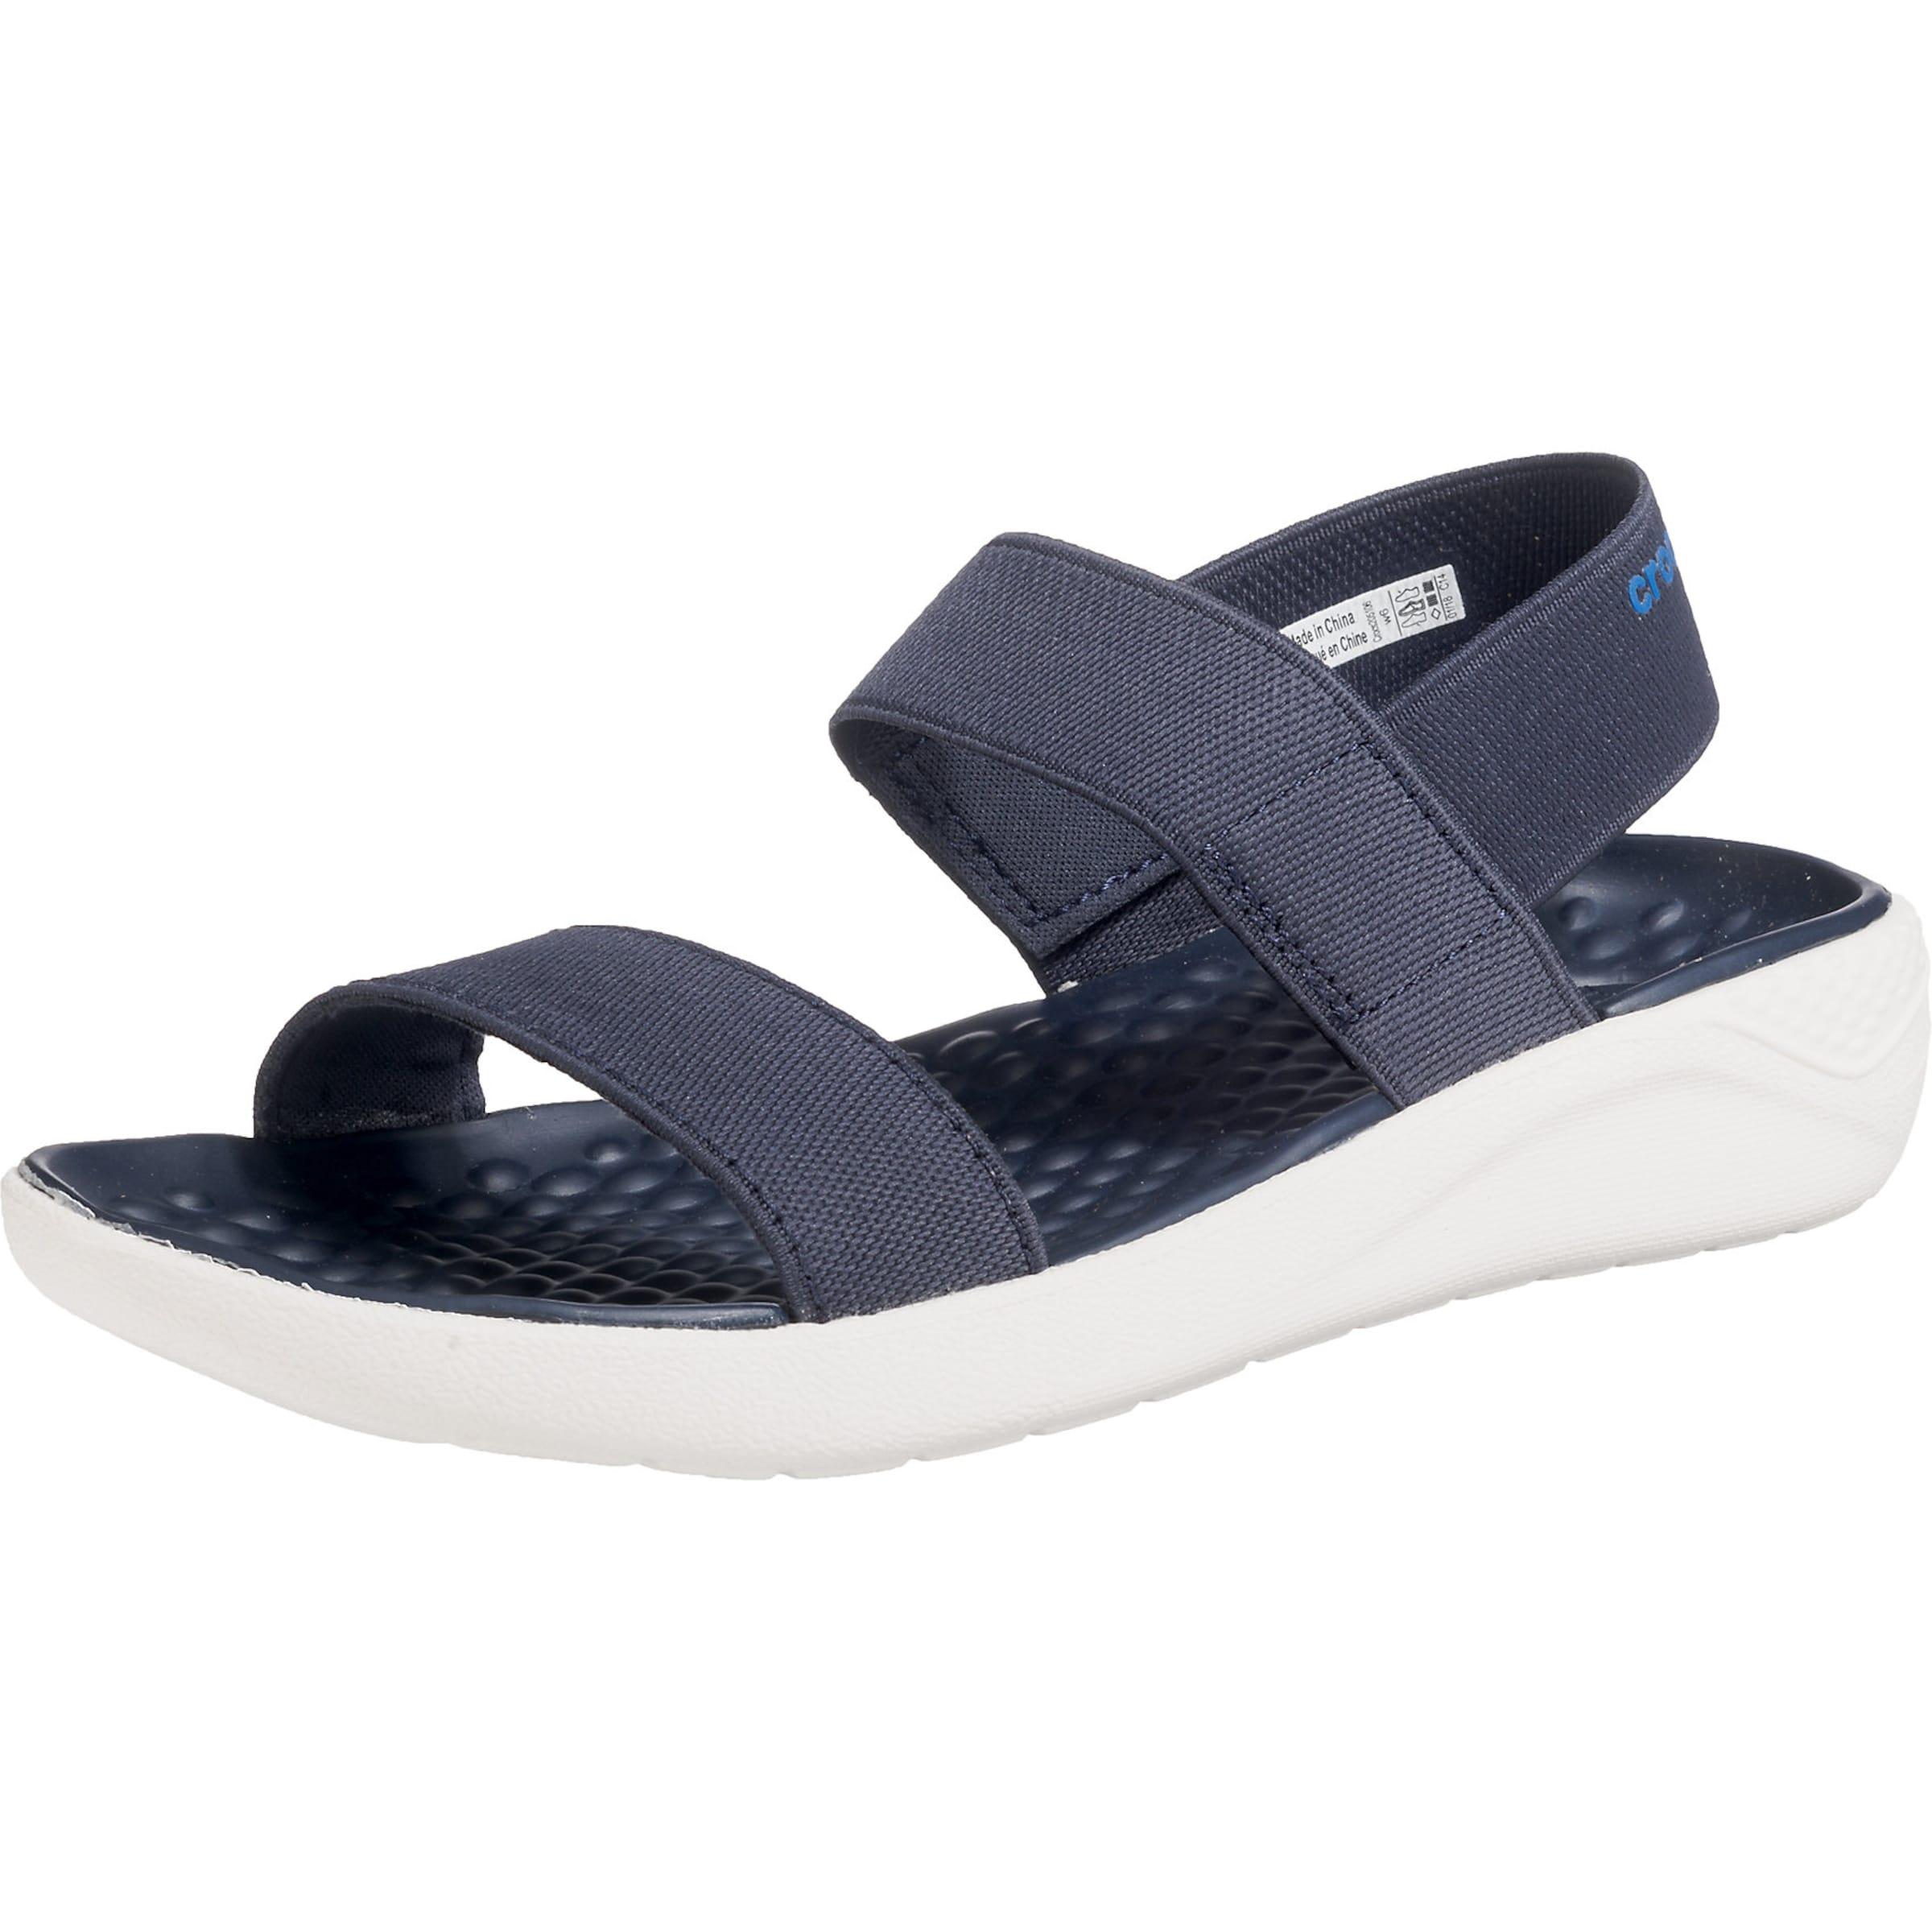 Crocs Komfort-Sandalen  LiteRide Sandal W